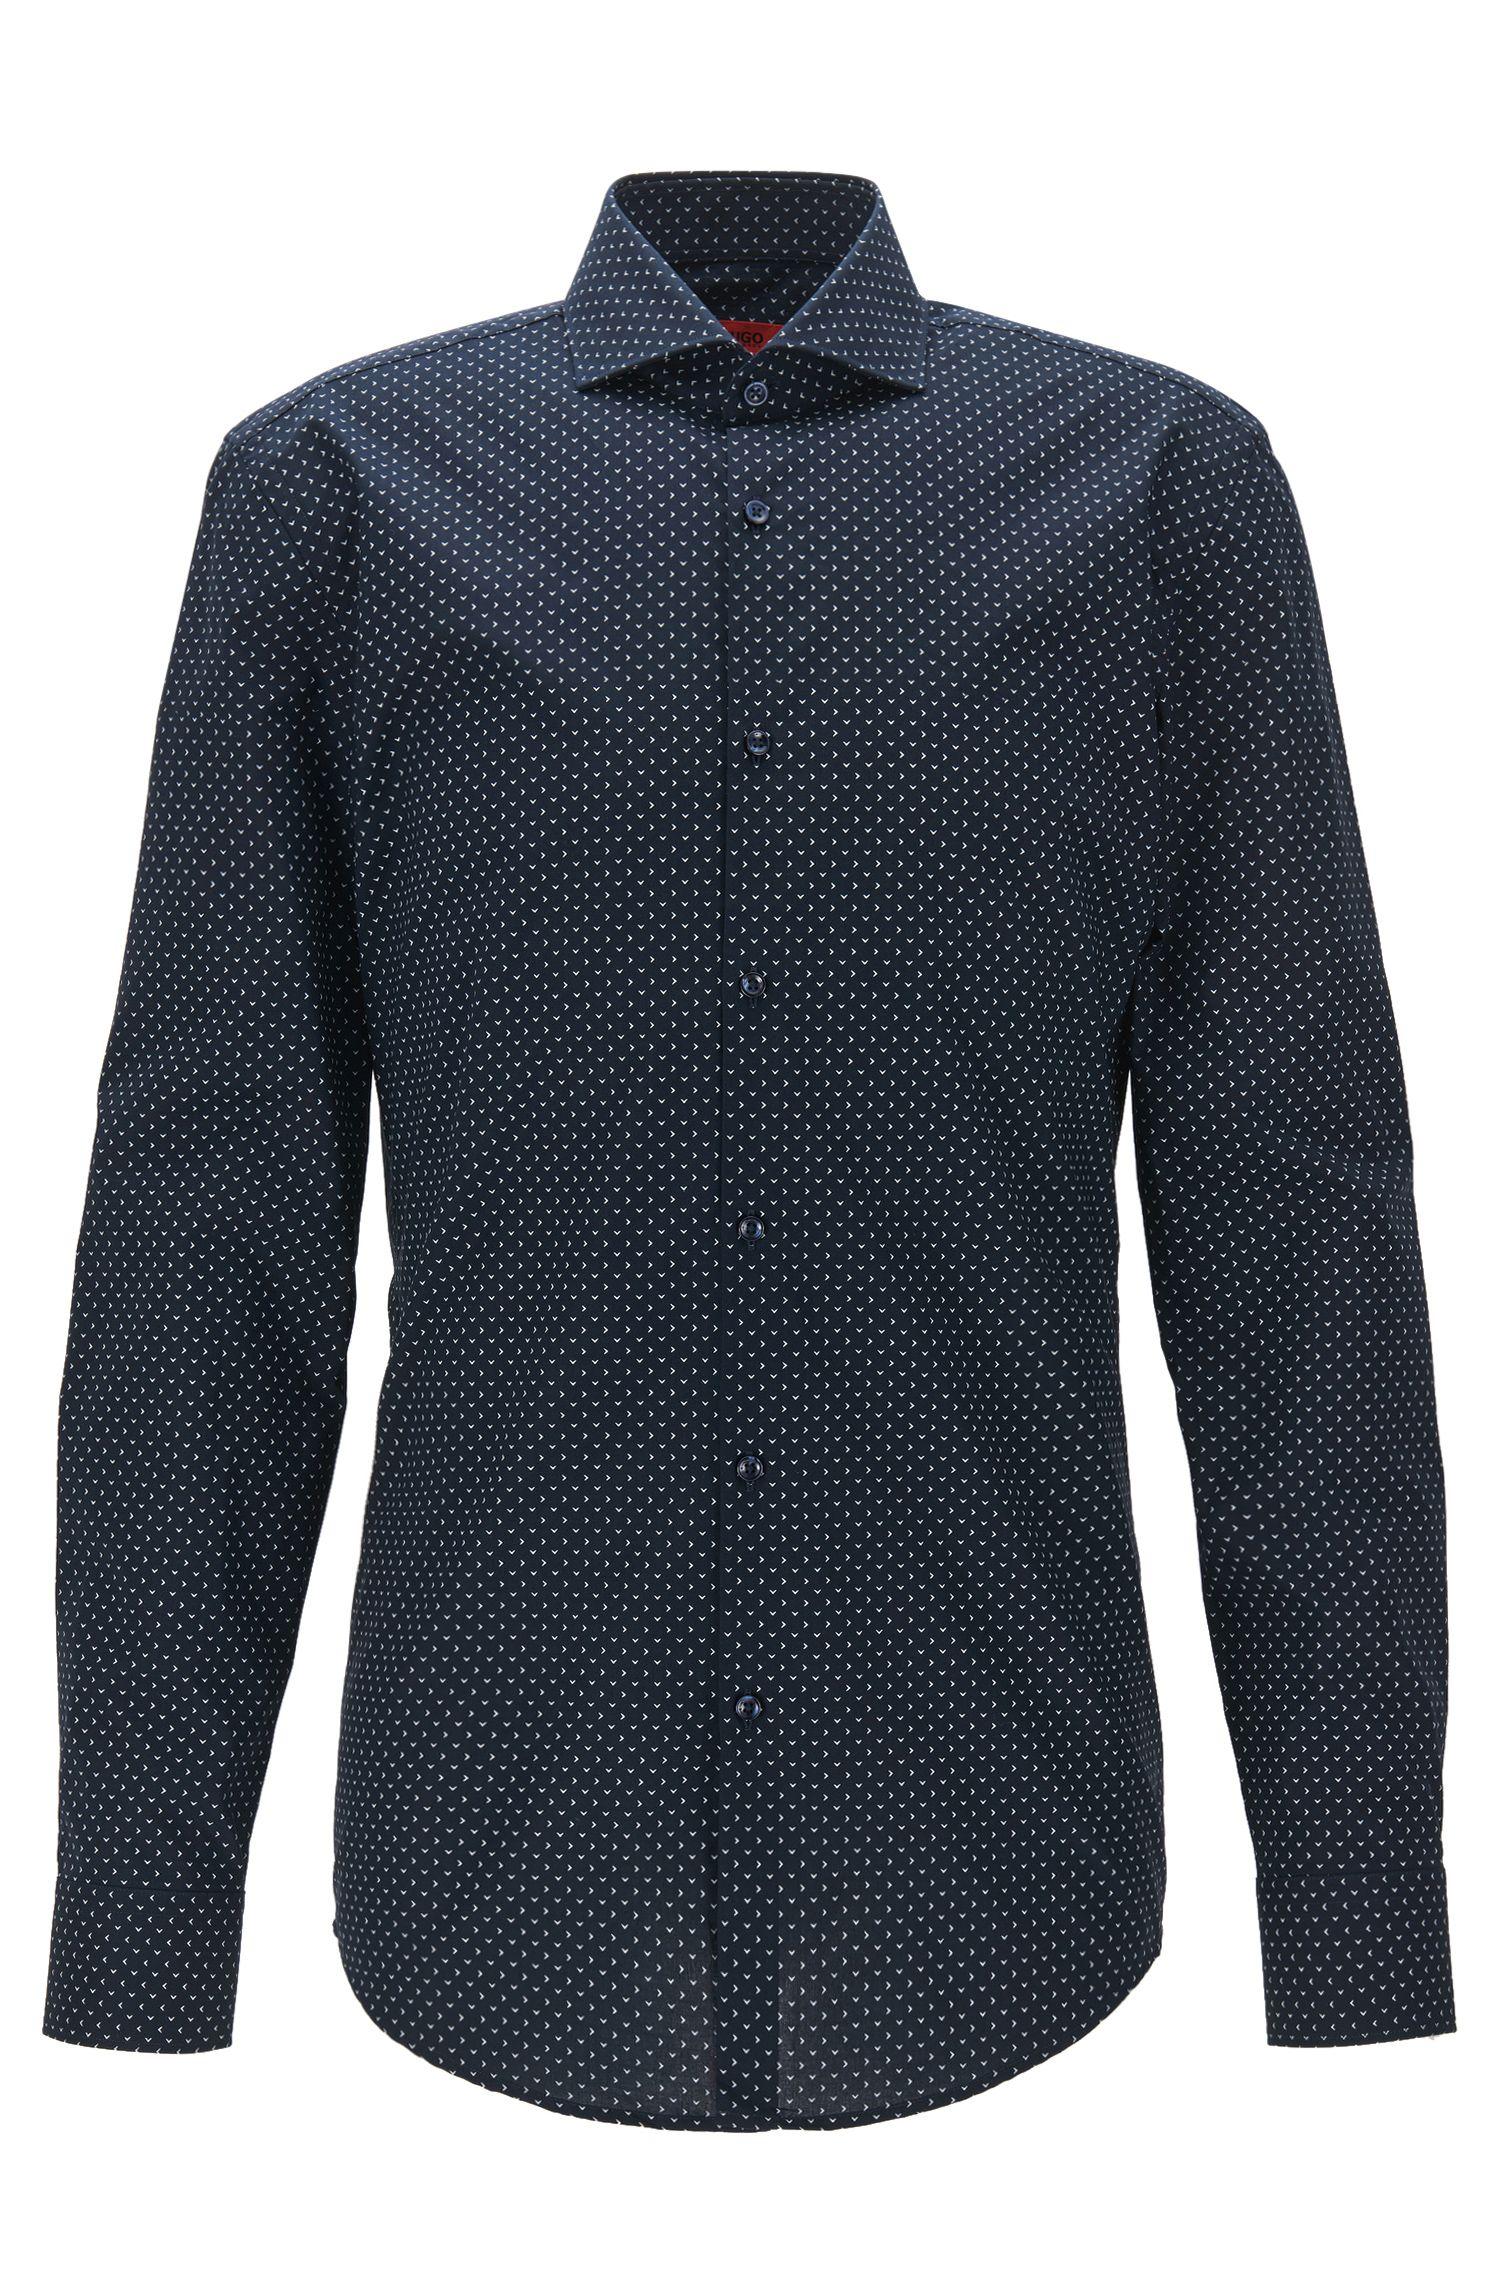 Printed slim-fit shirt in cotton poplin